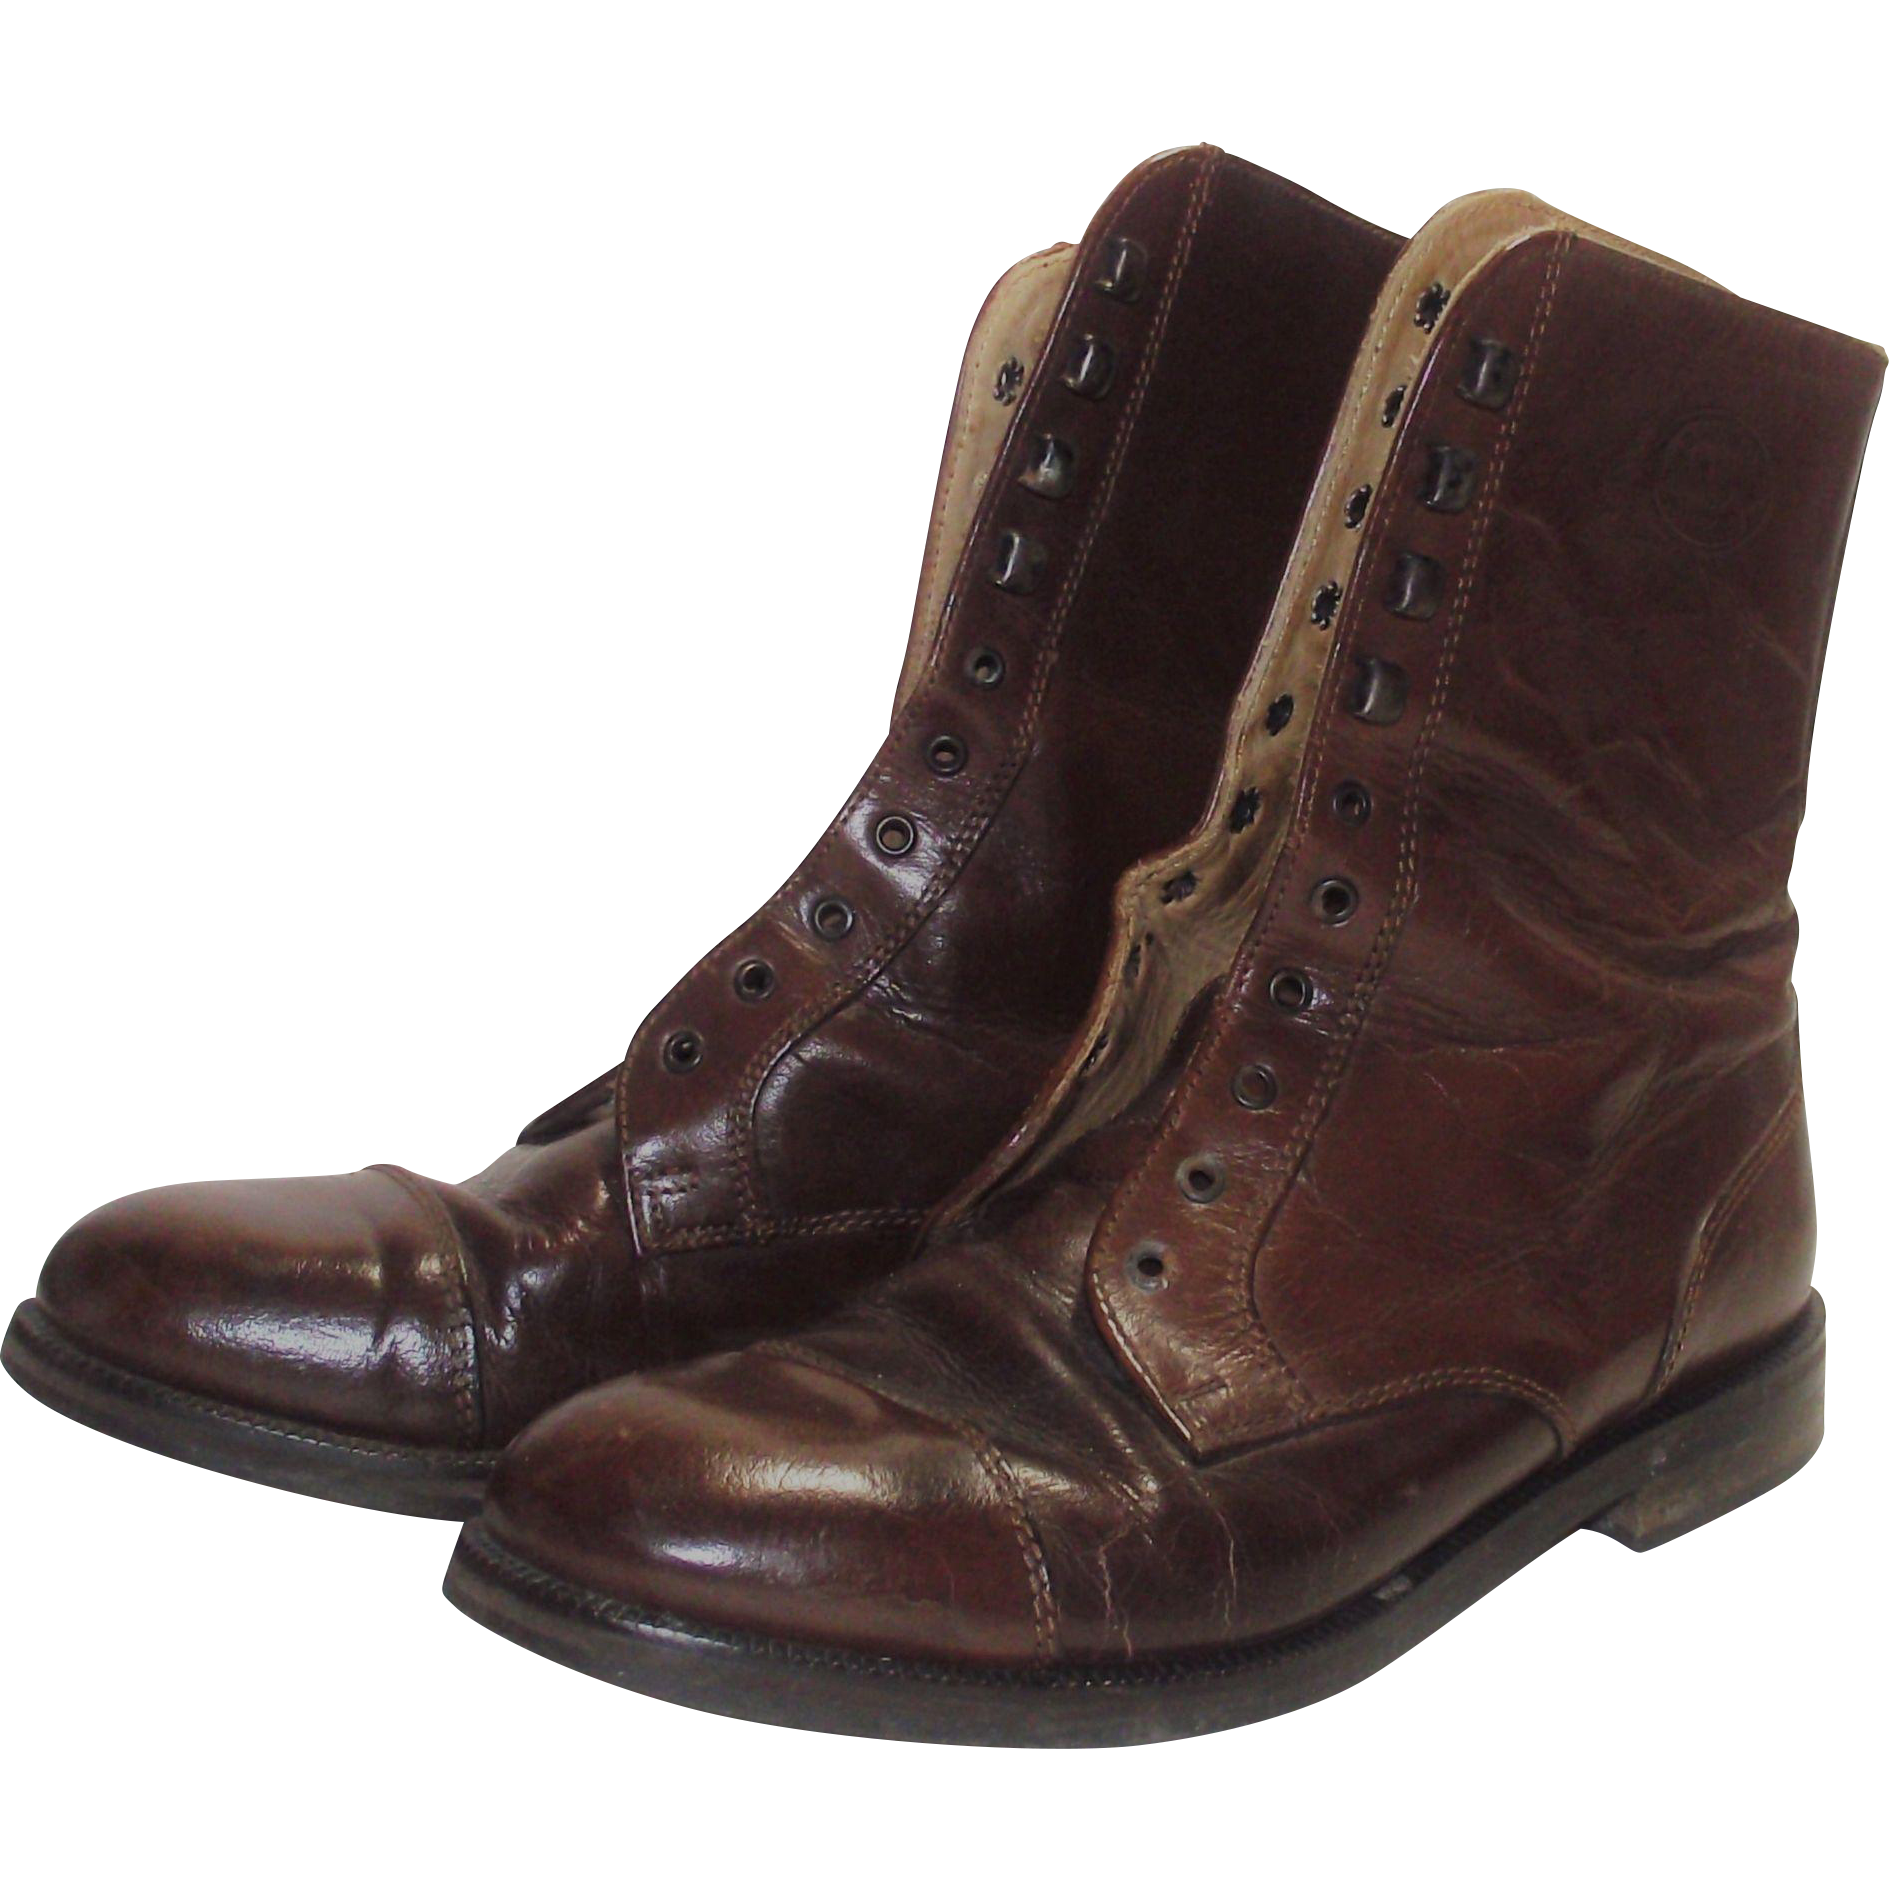 Vintage Italian Boots 15